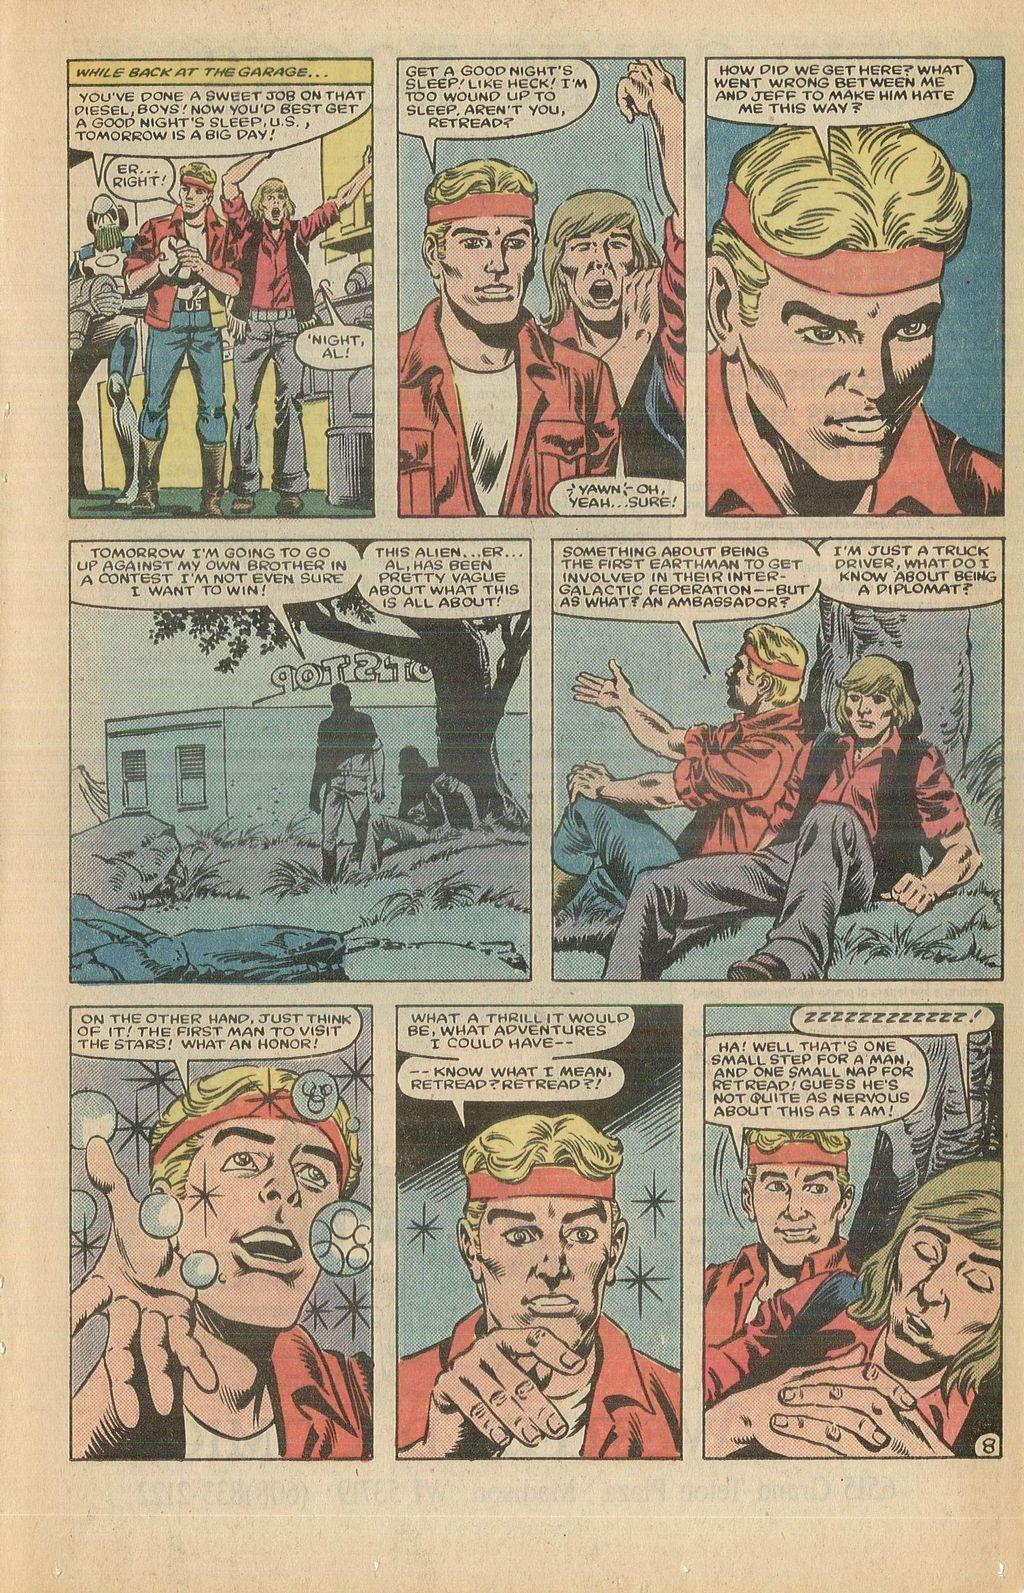 Read online U.S. 1 comic -  Issue #12 - 13